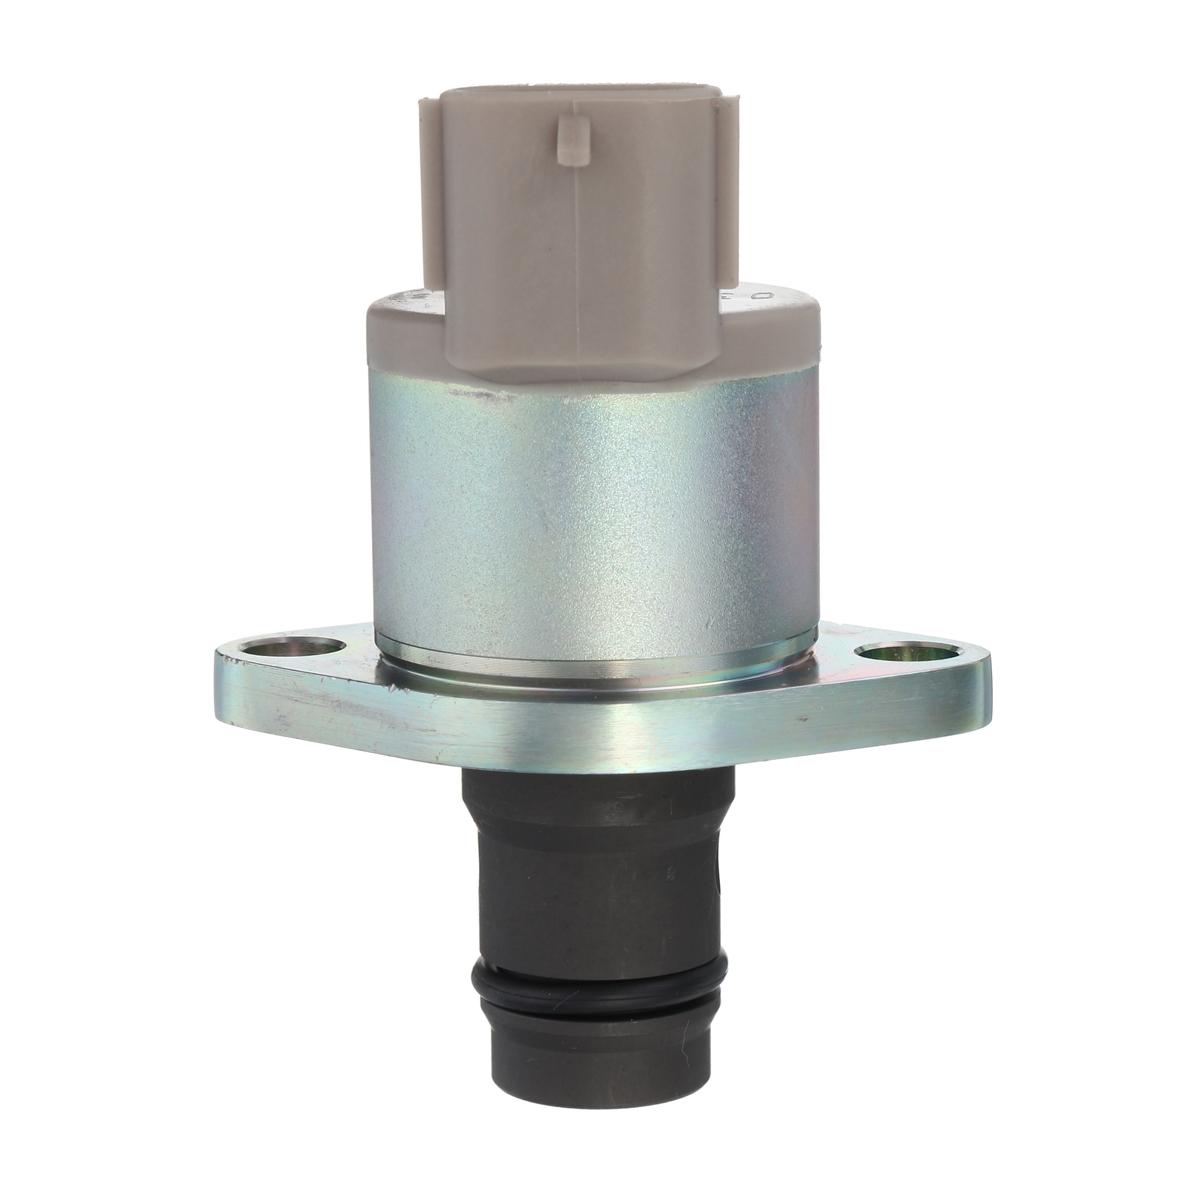 FORD TRANSIT MK7 2.2 2.4 3.2 FUEL PUMP INLET METERING VALVE PRESSURE REGULATOR